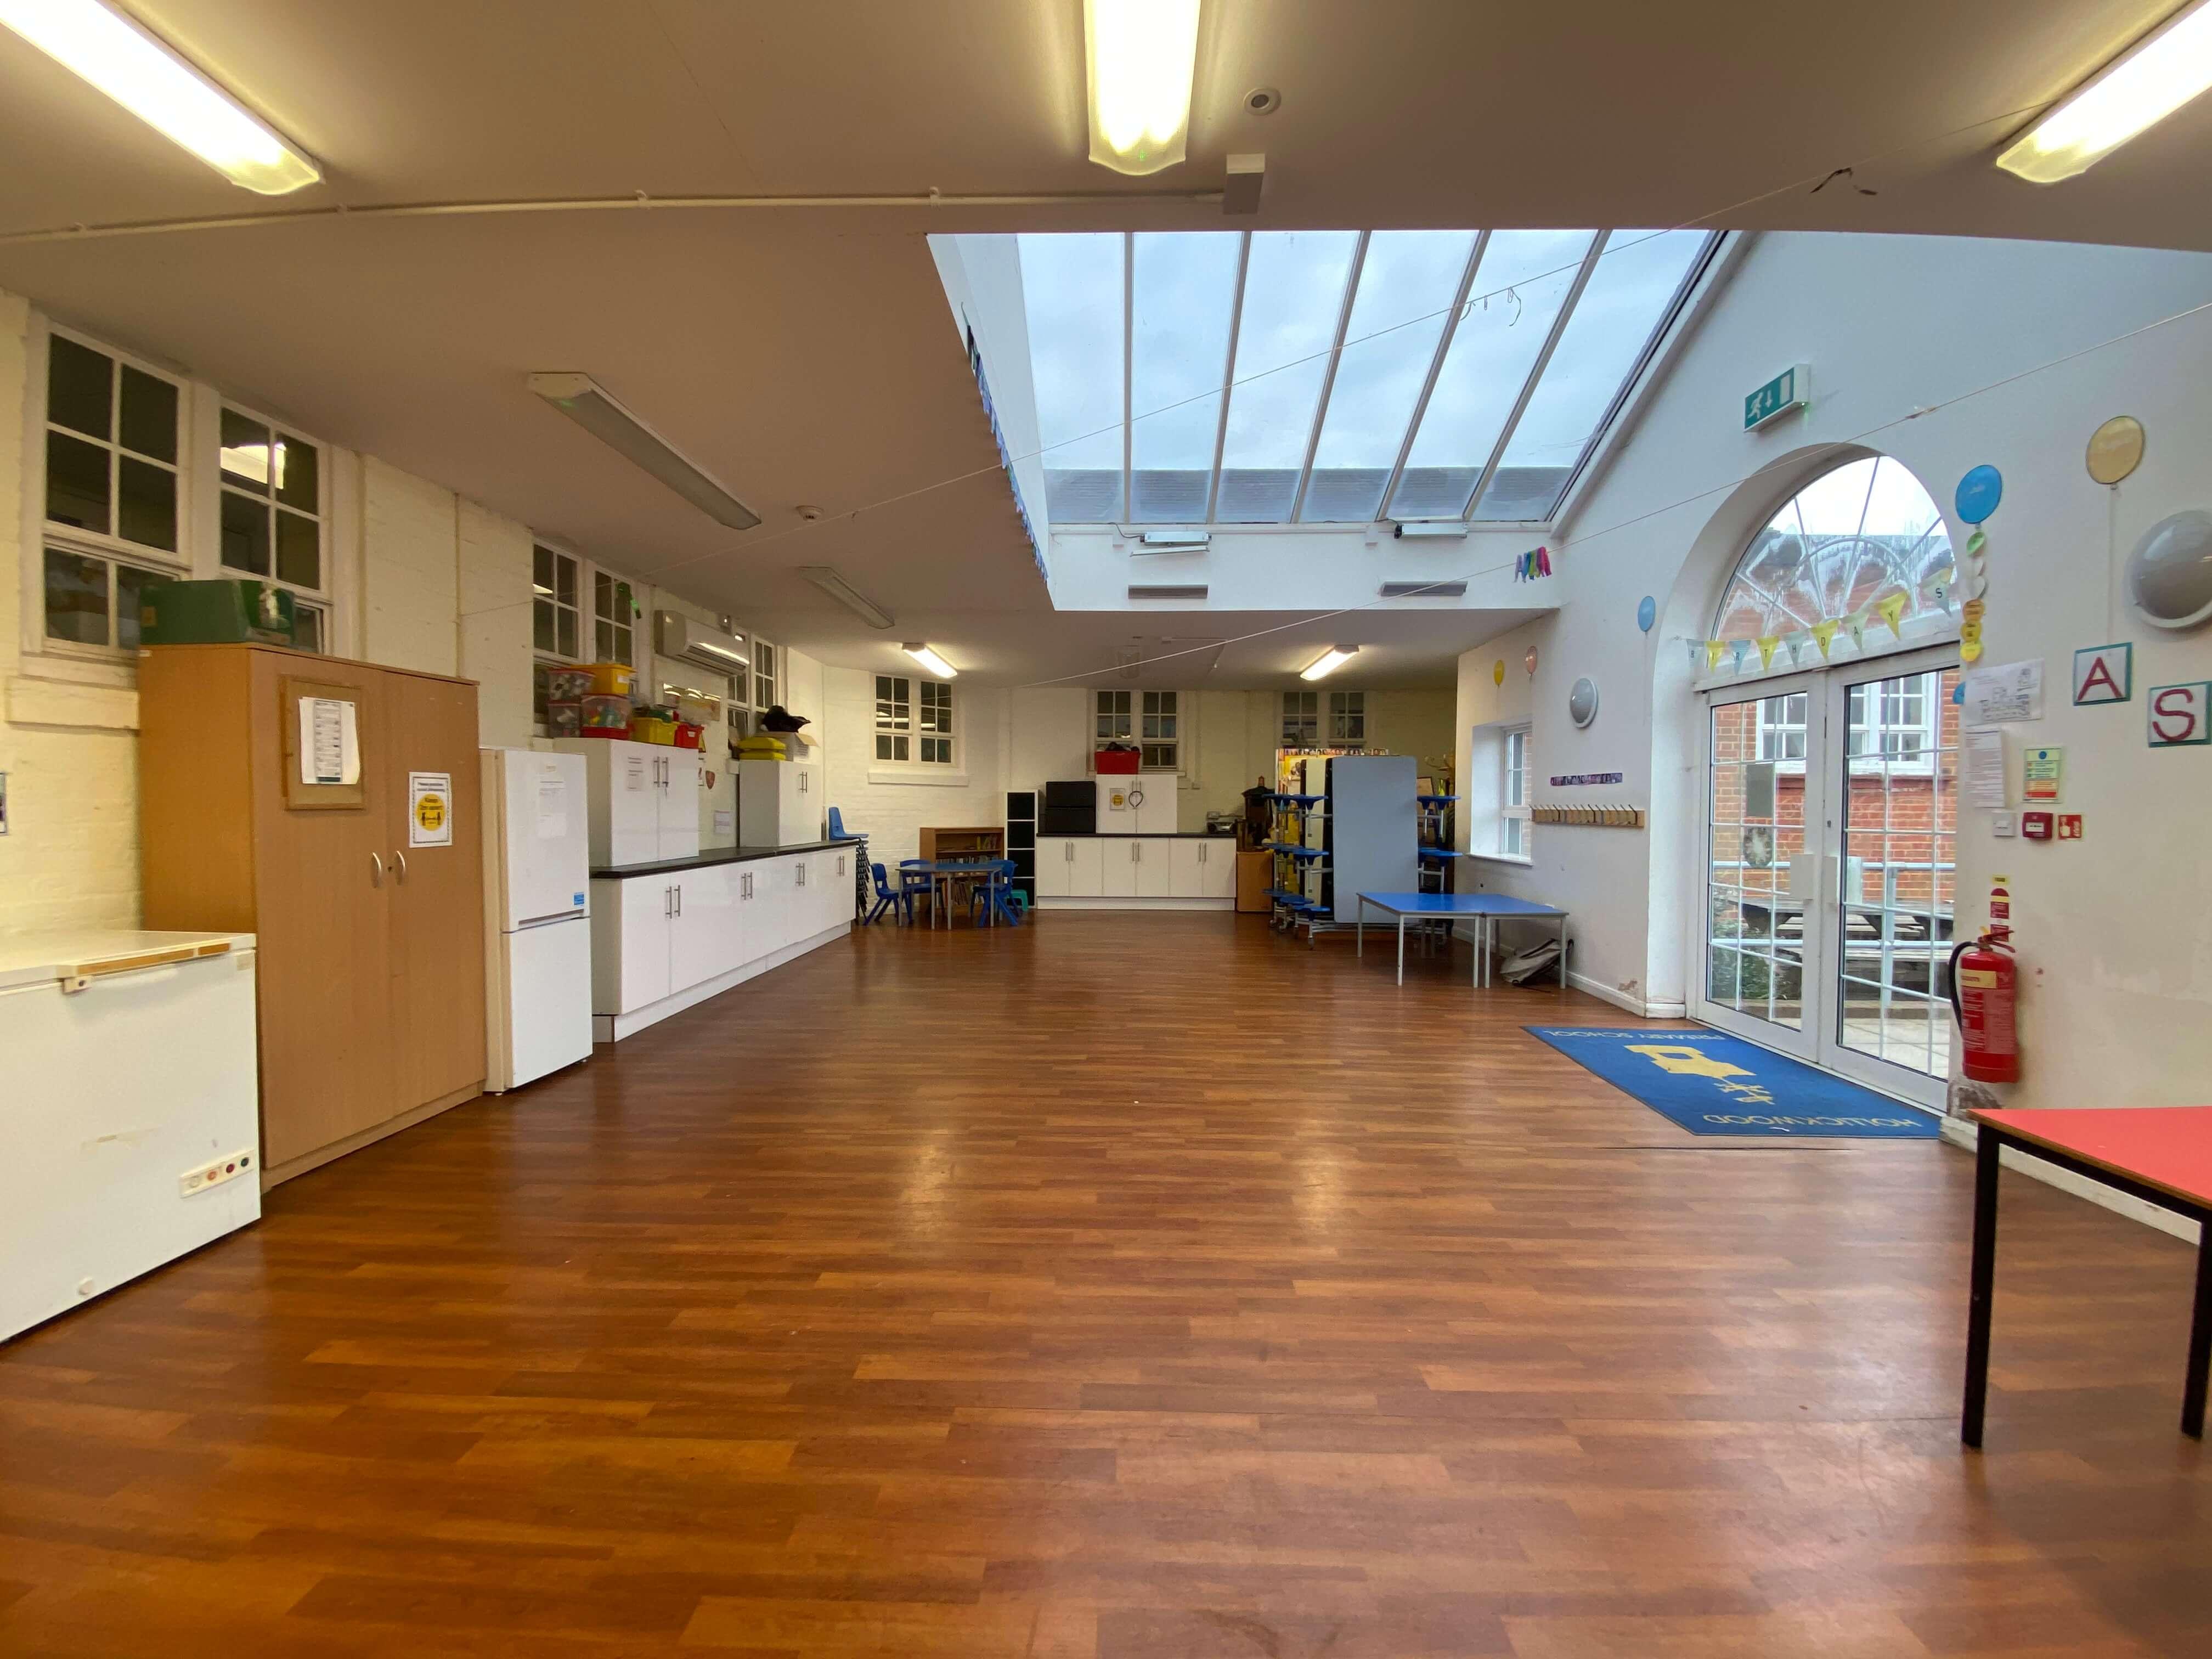 Hollickwood Primary School Small Hall